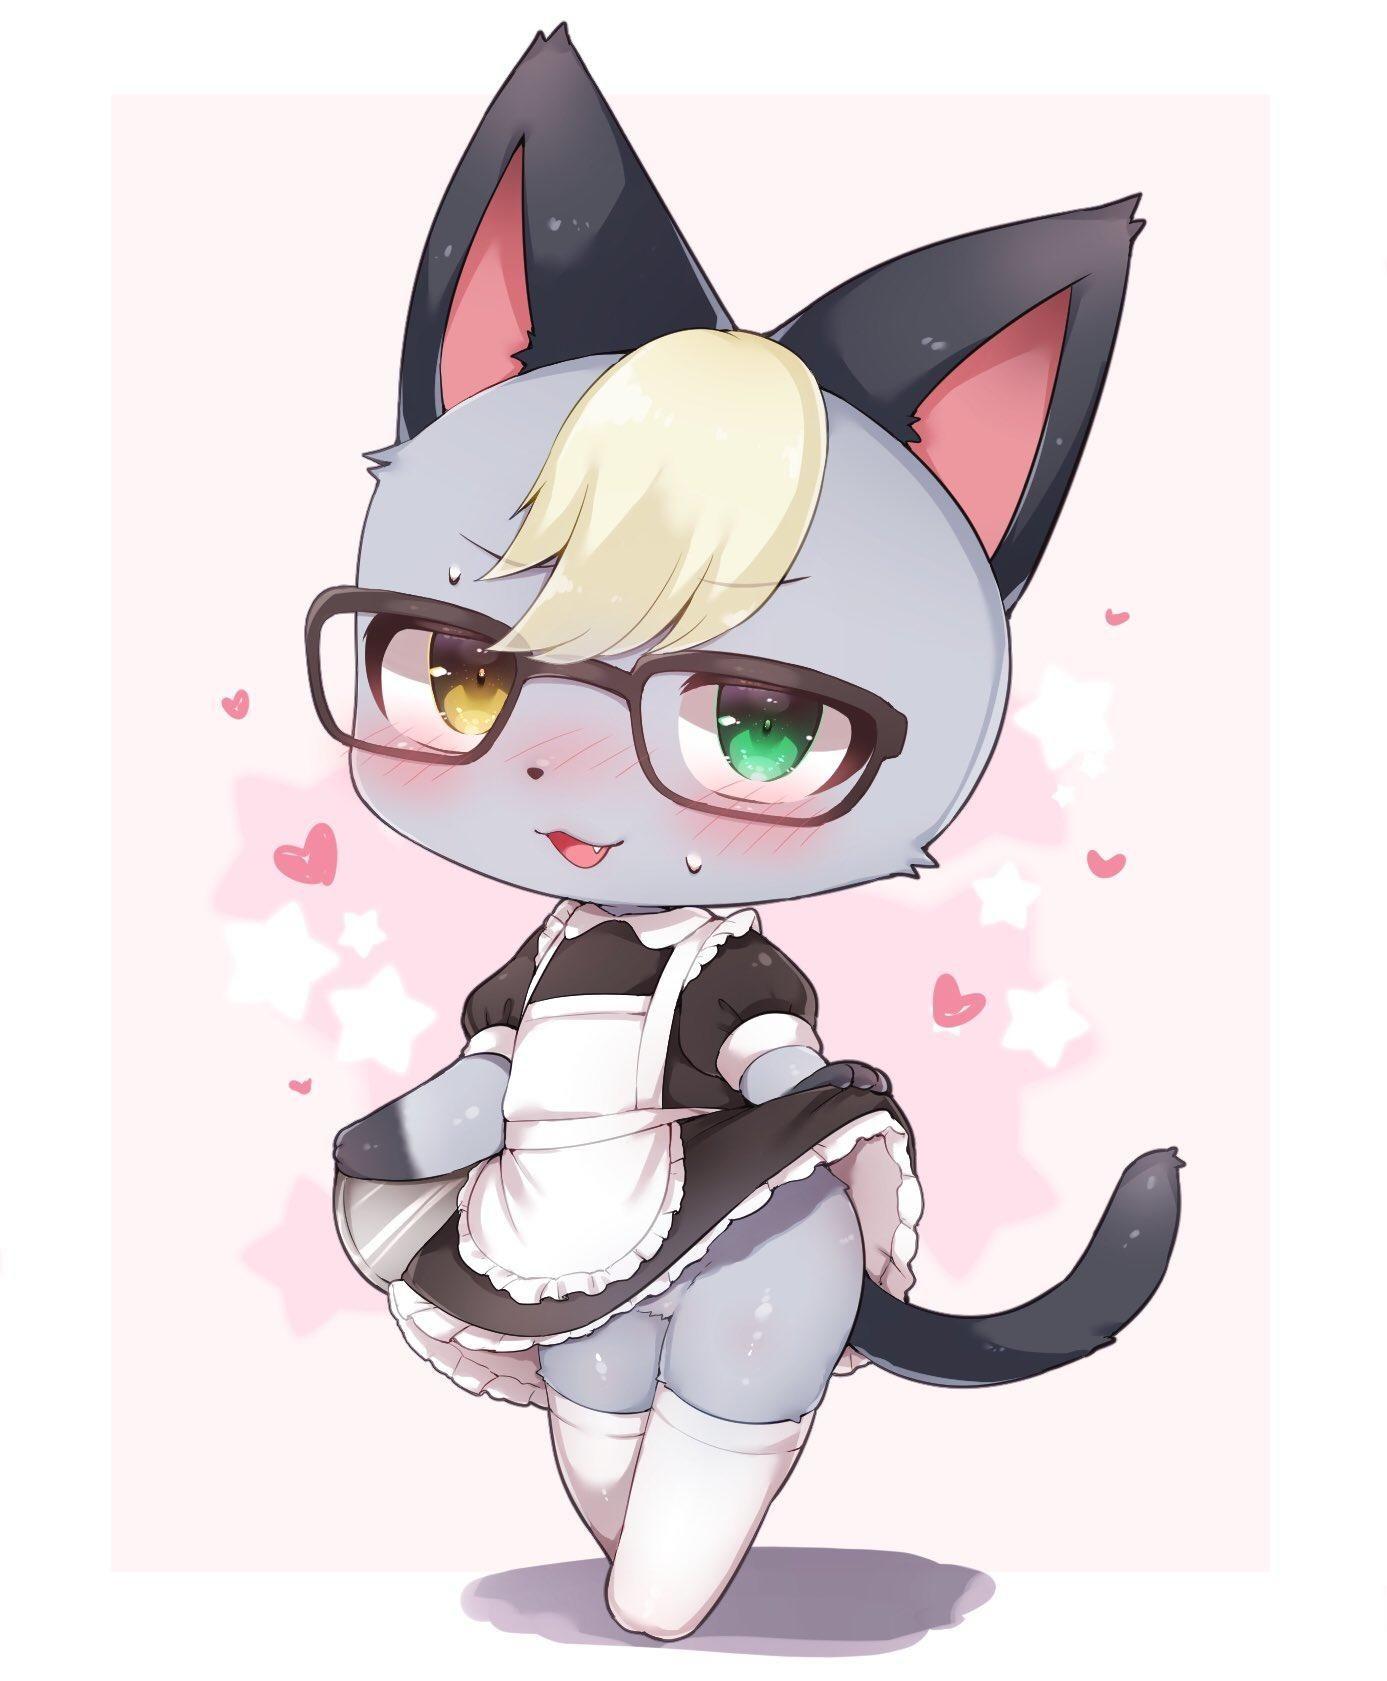 Maid Raymond Raymond In 2020 Animal Crossing Fan Art Animal Crossing Characters Animal Crossing Qr